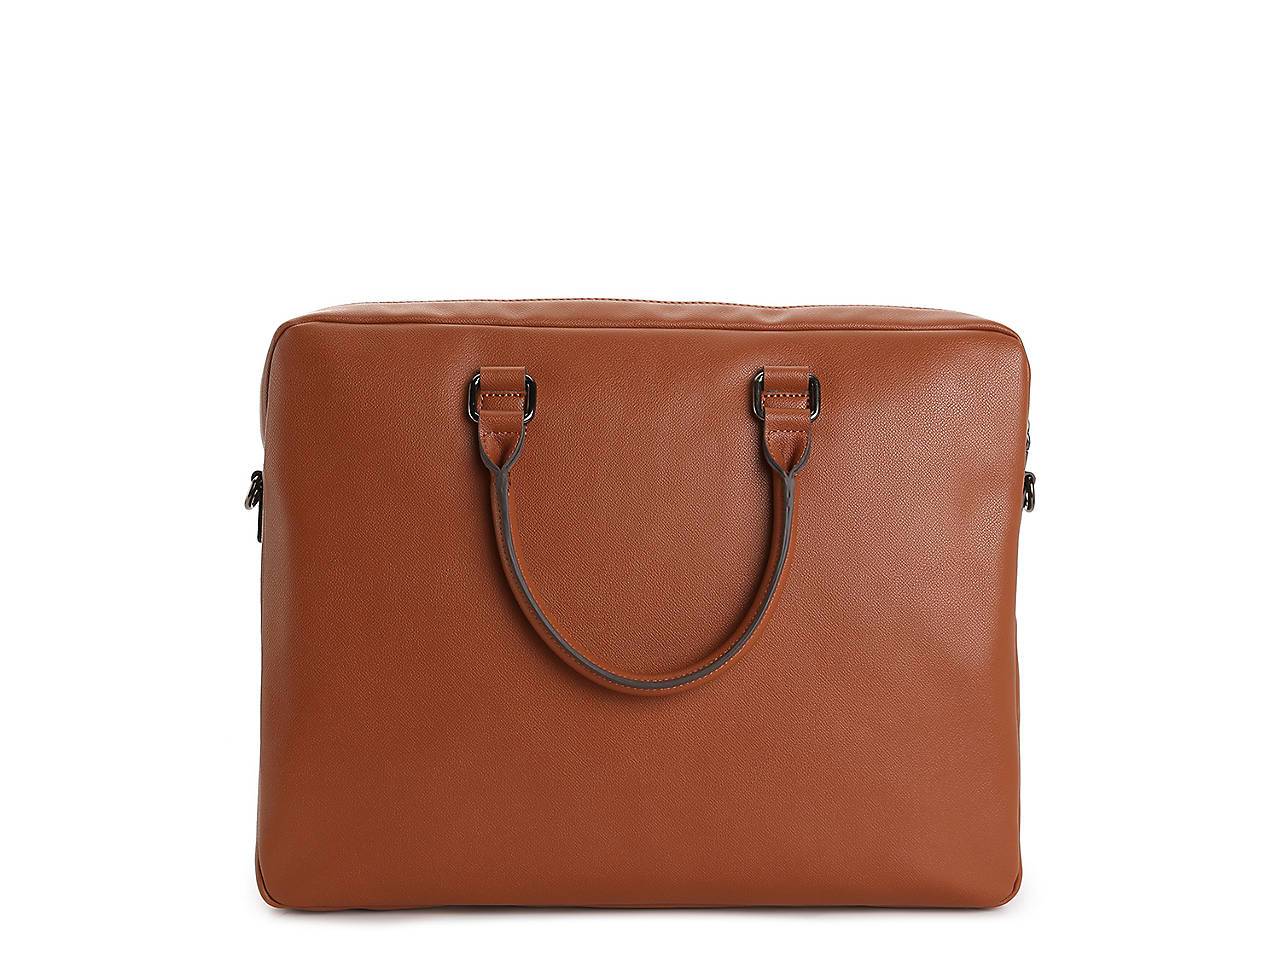 29cb5b226c Aldo Braunna Messenger Bag Men s Handbags   Accessories